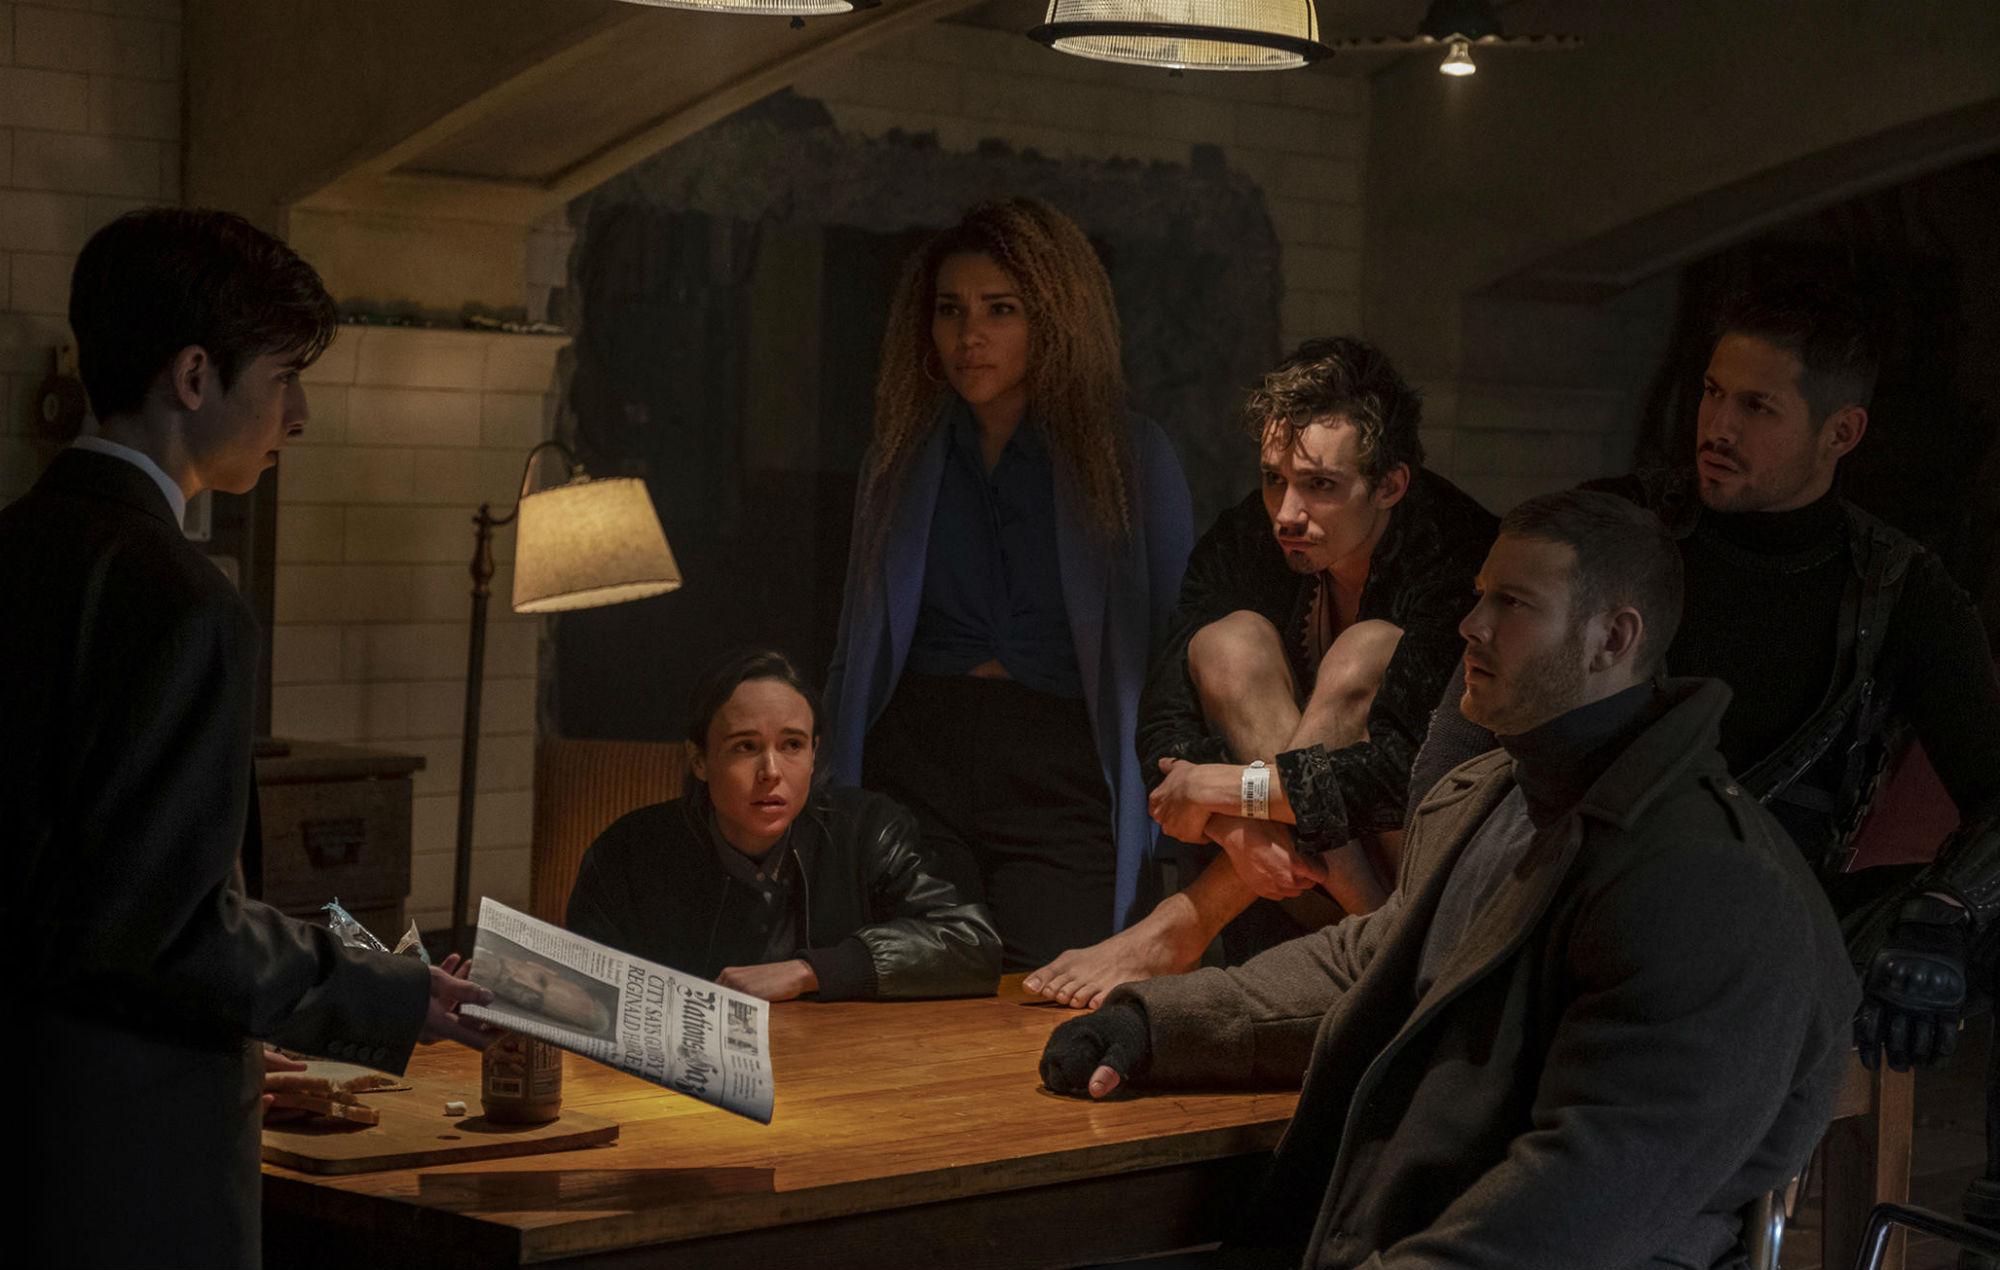 'The Umbrella Academy' season 2 is coming soon, Netflix teases